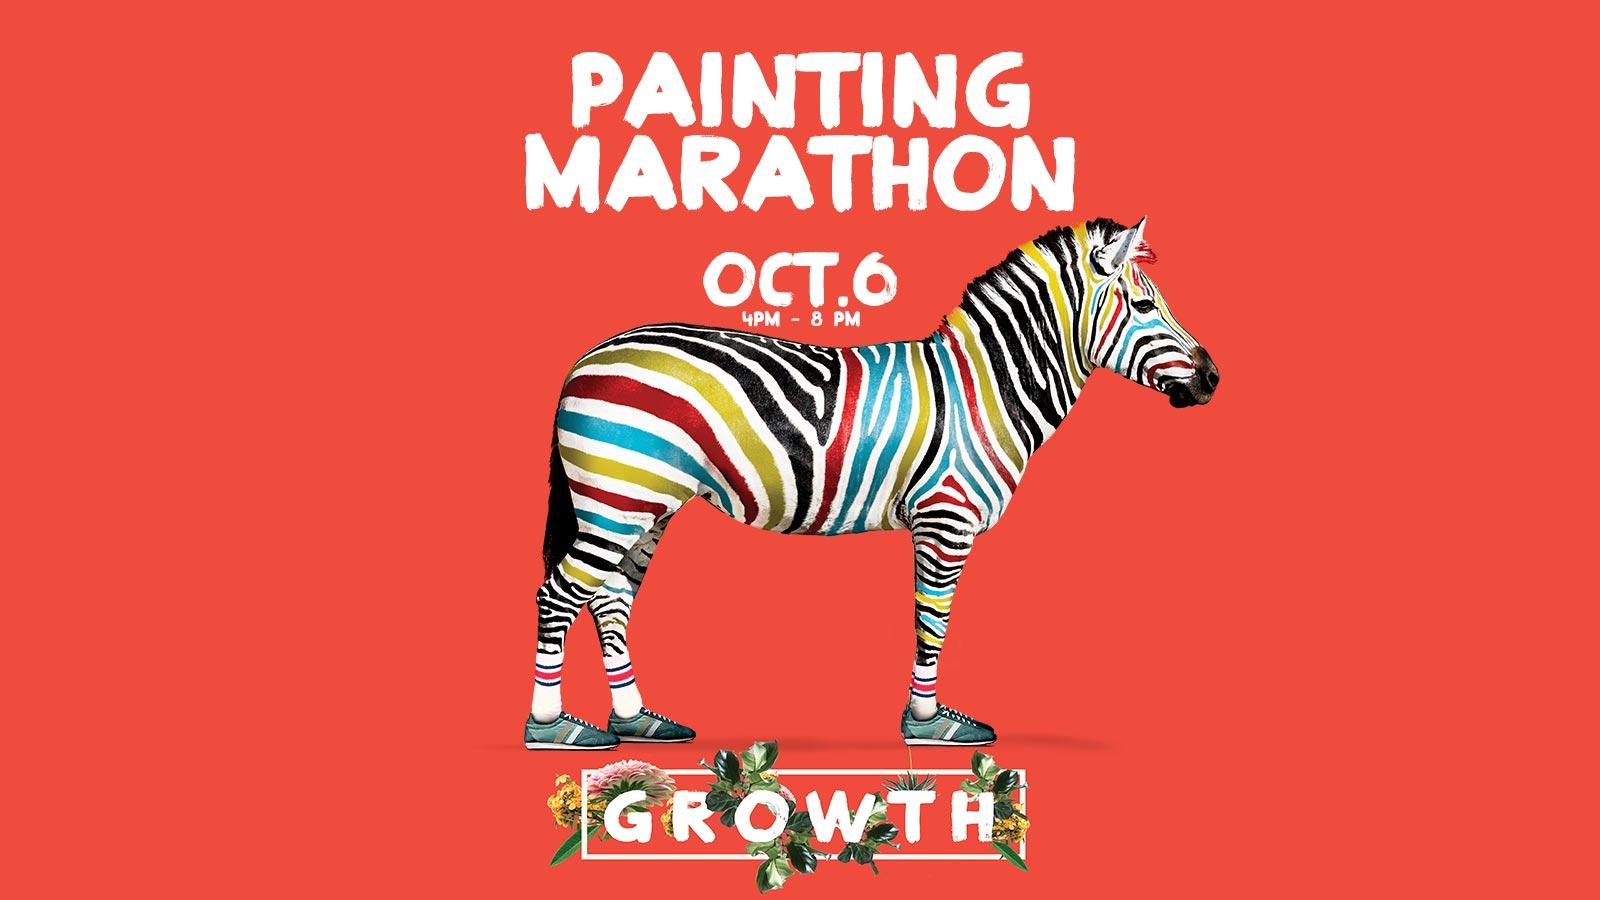 Painting Marathon 2017 bend oregon